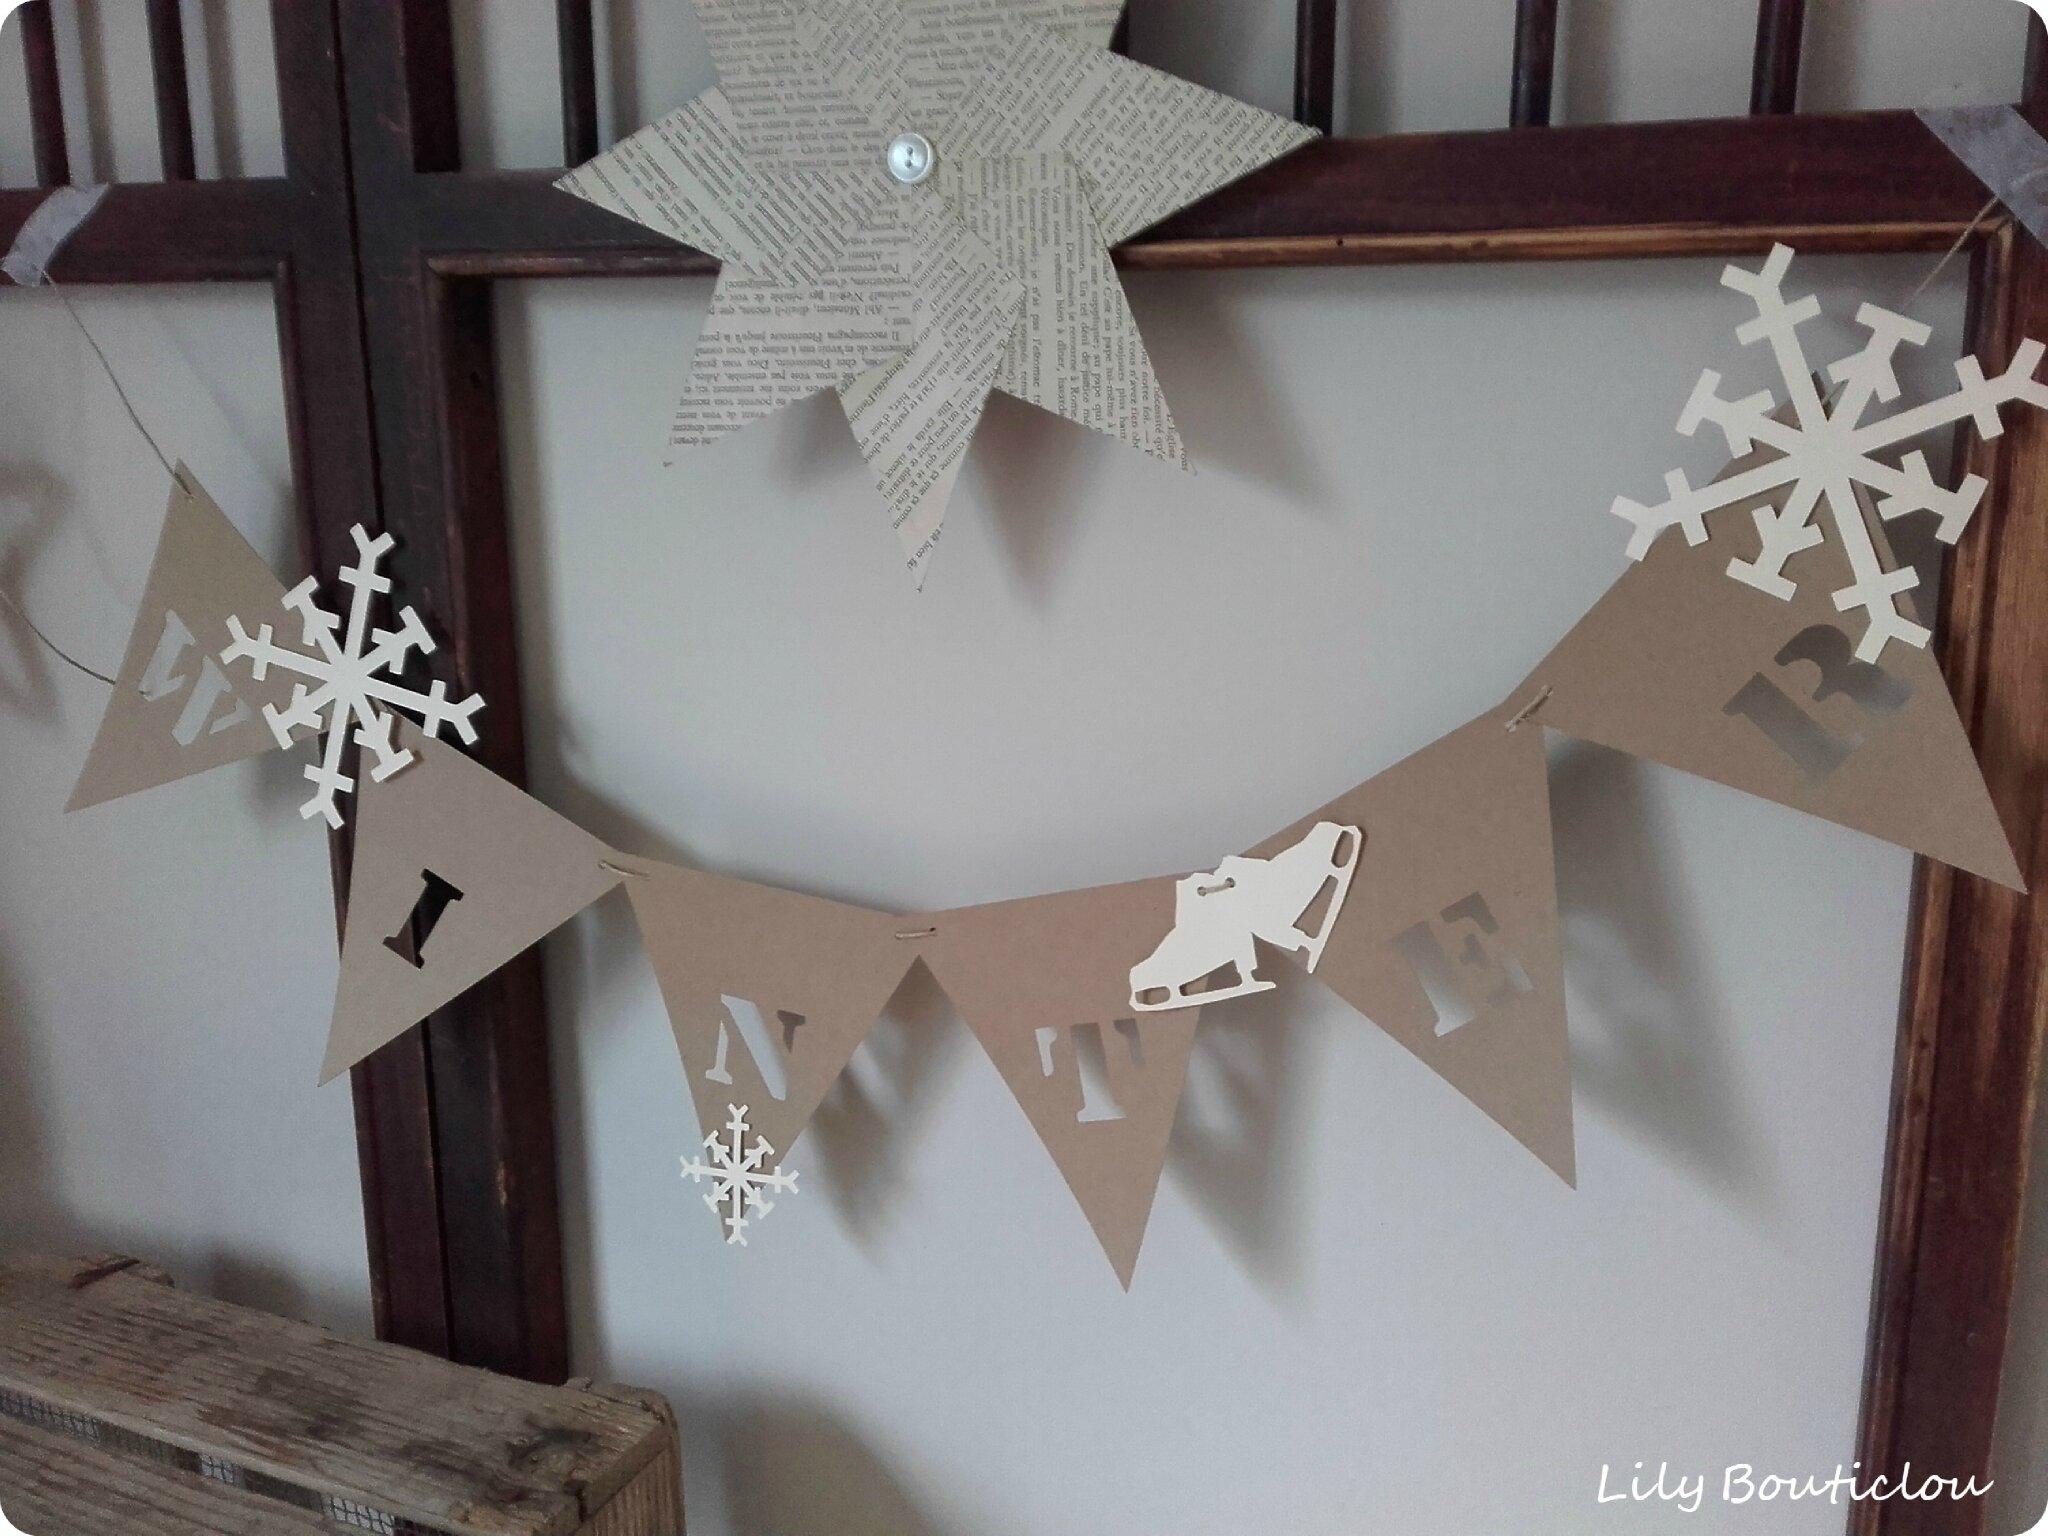 guirlande fanions carton pennant garland cardboard winter 4 lilybouticlou